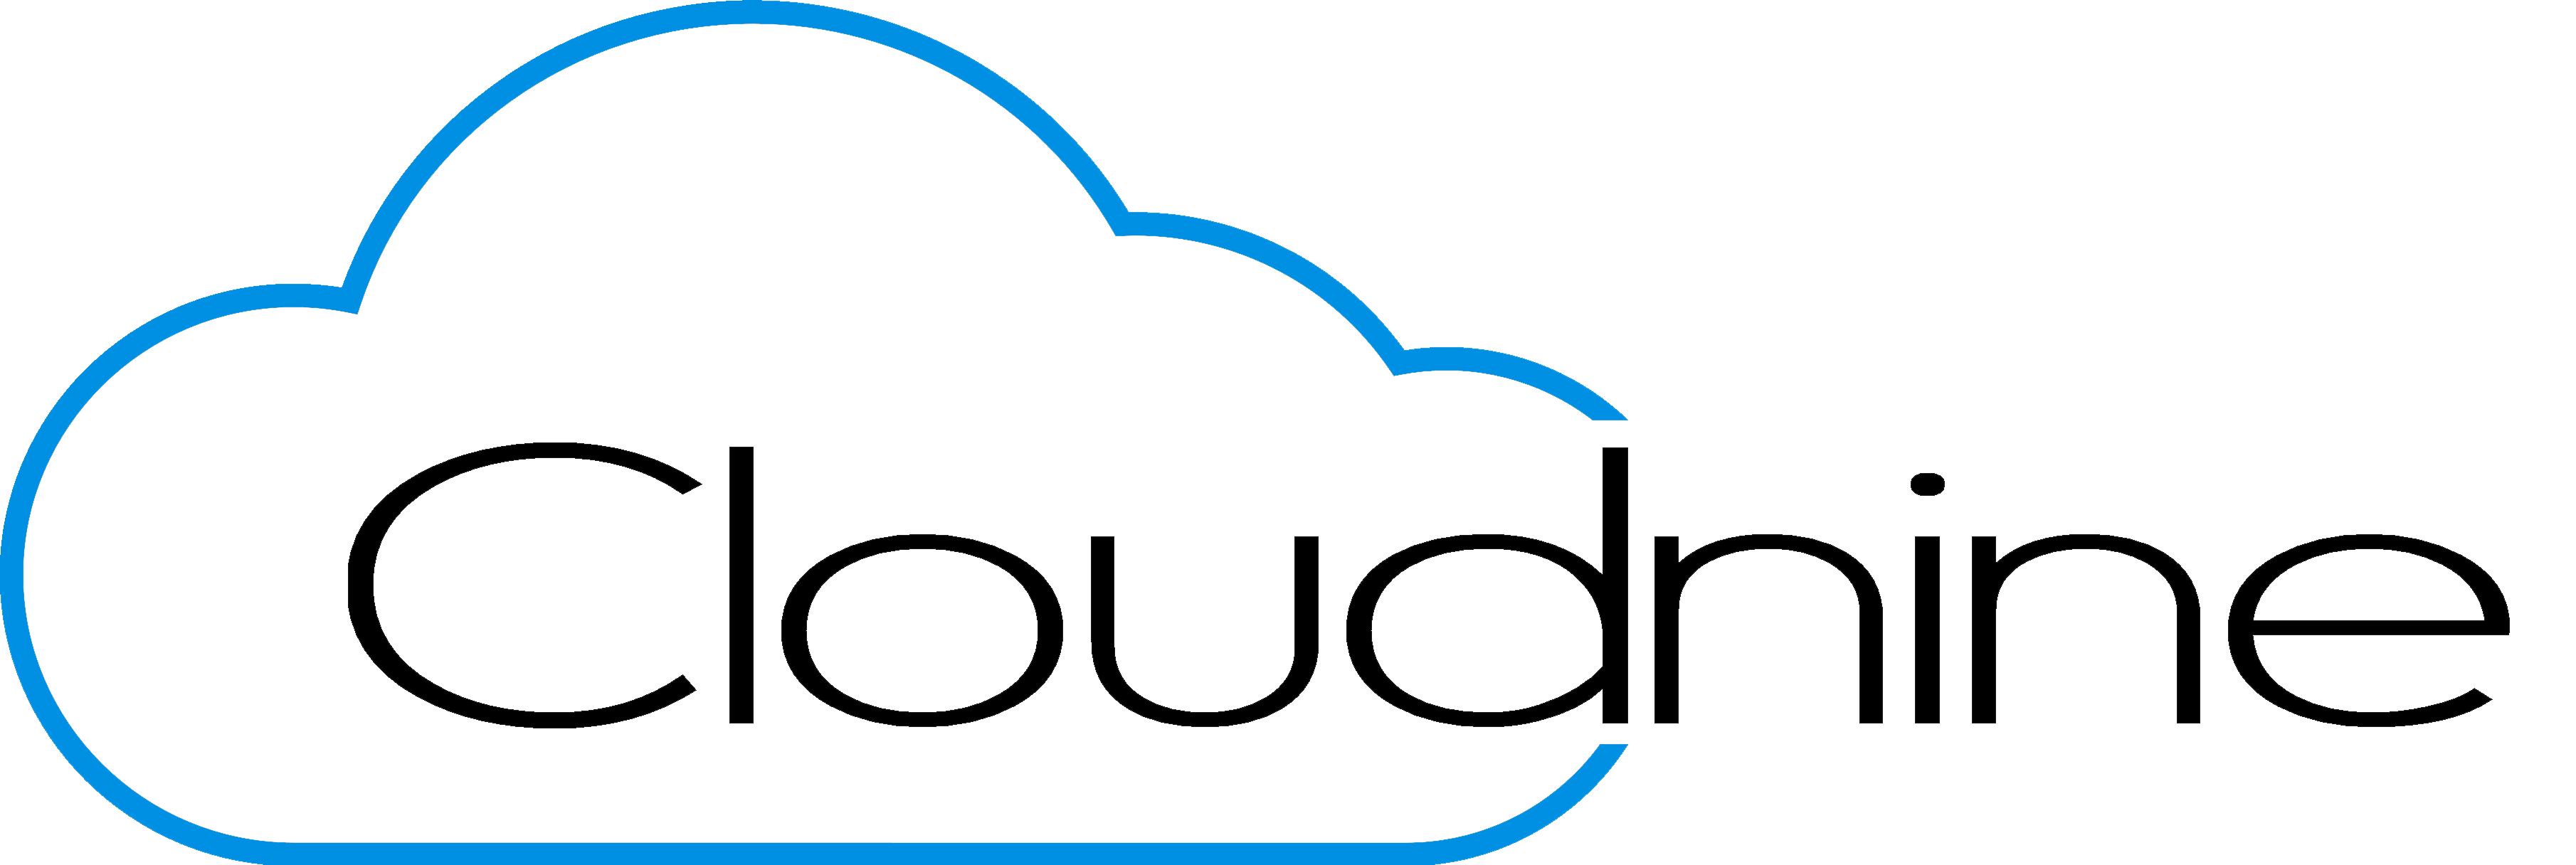 Cloudnine.nl